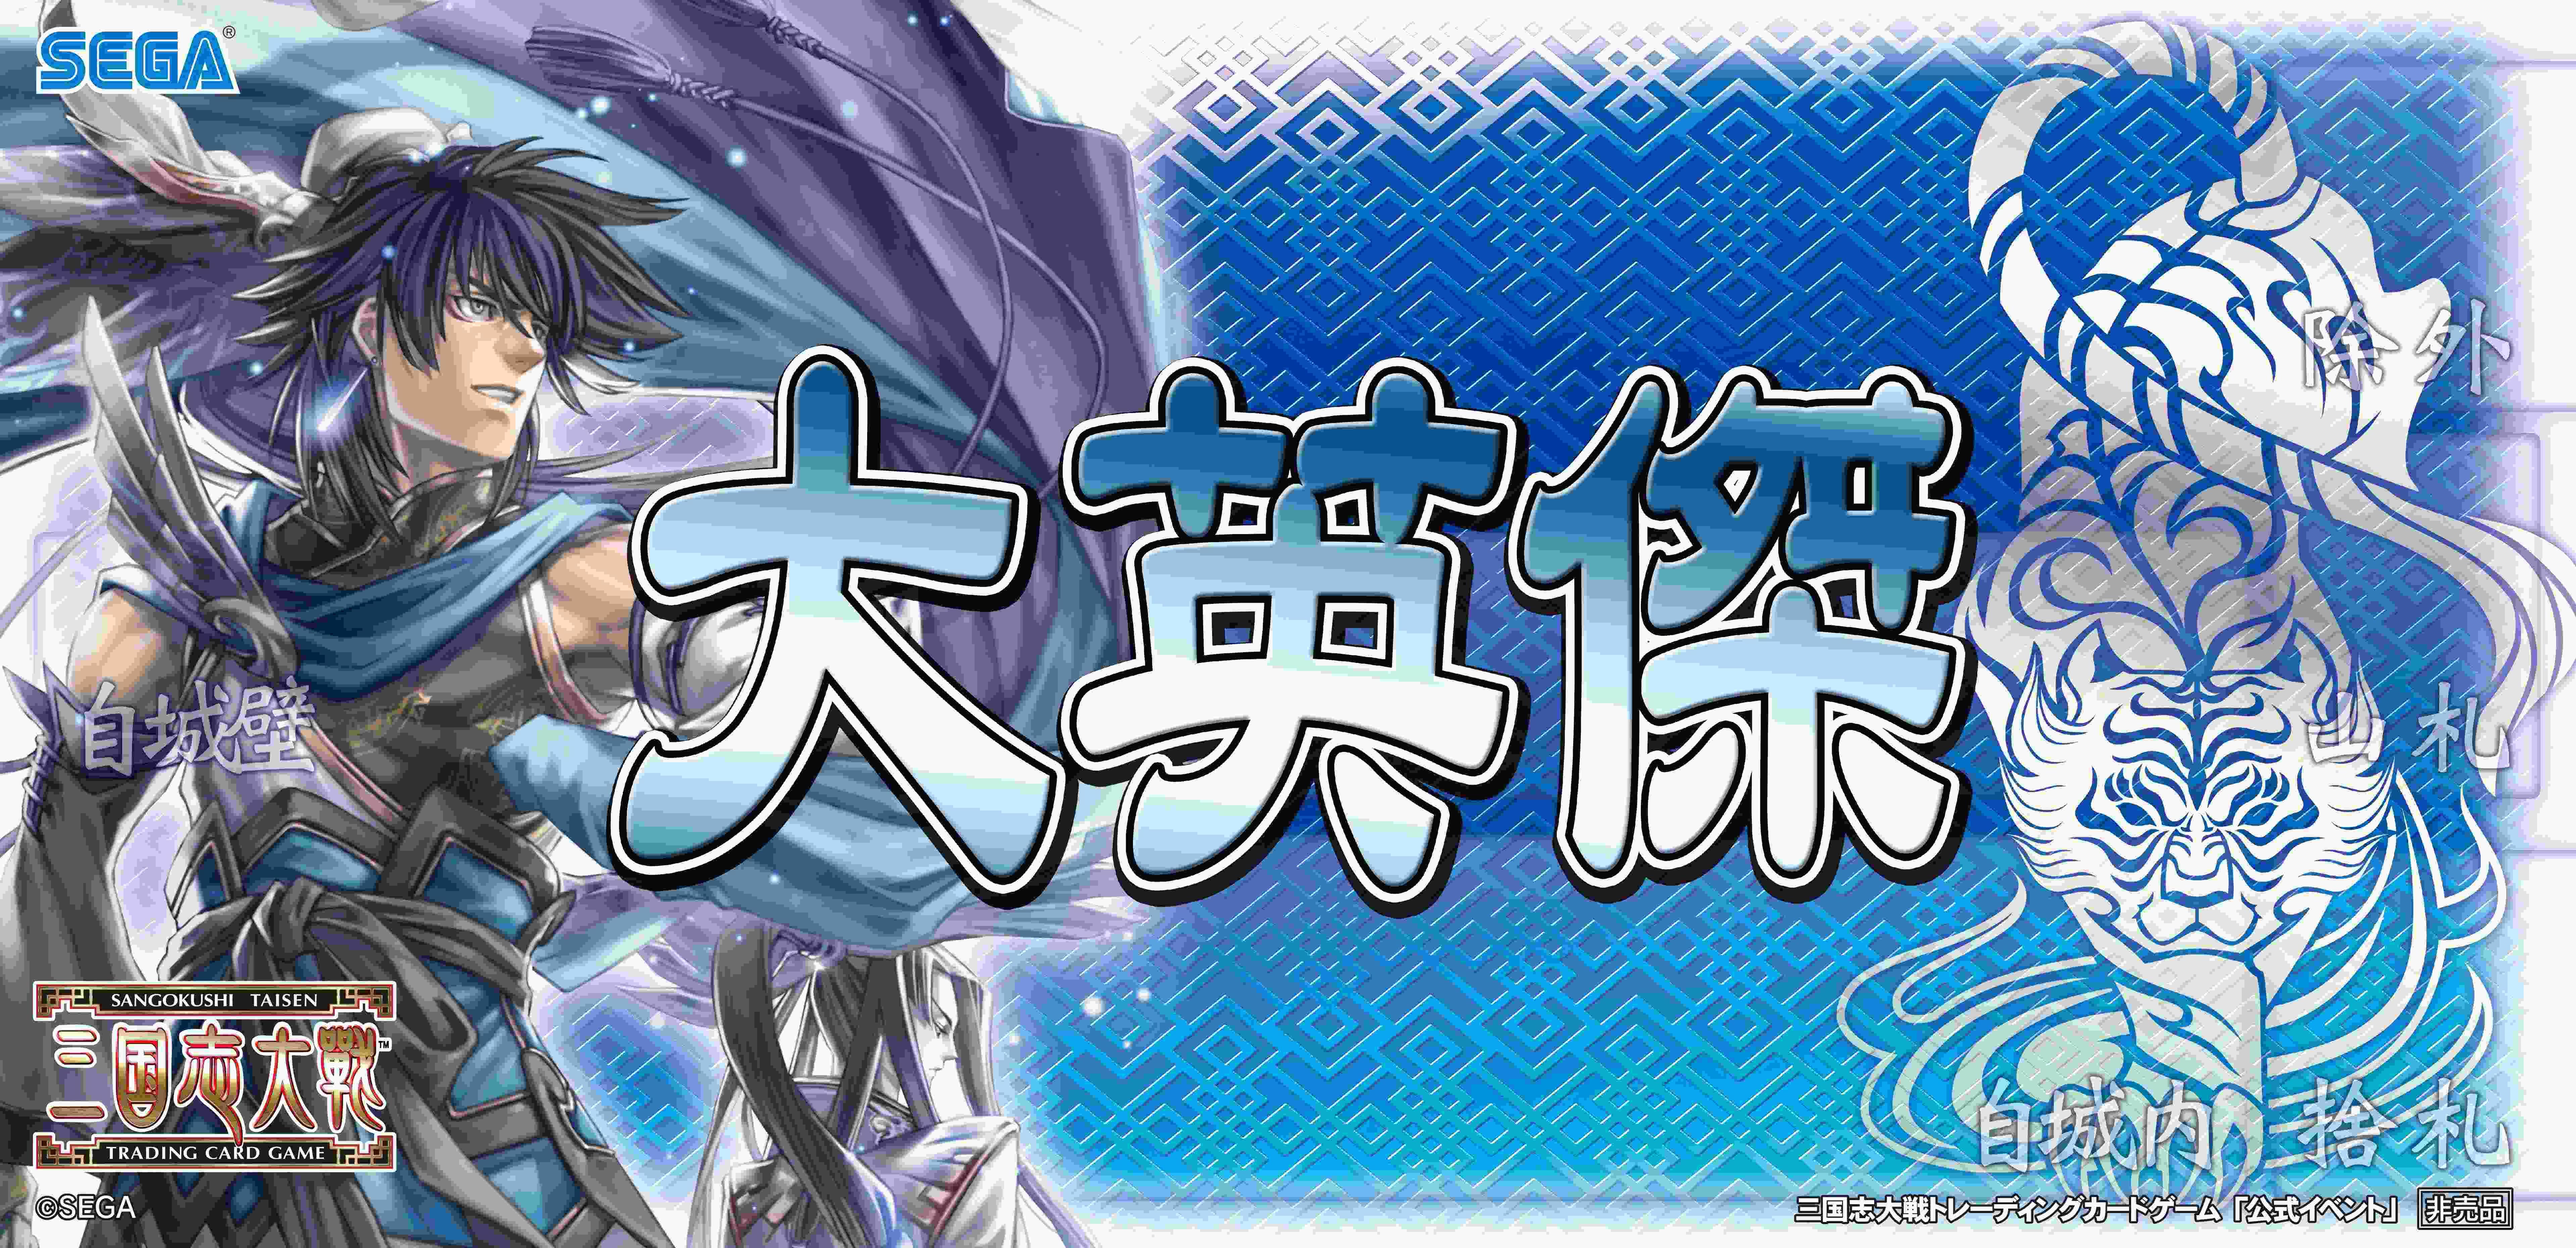 【6/27 名古屋】「三国志大戦TCG」TCGの宴 in 名古屋 開催!